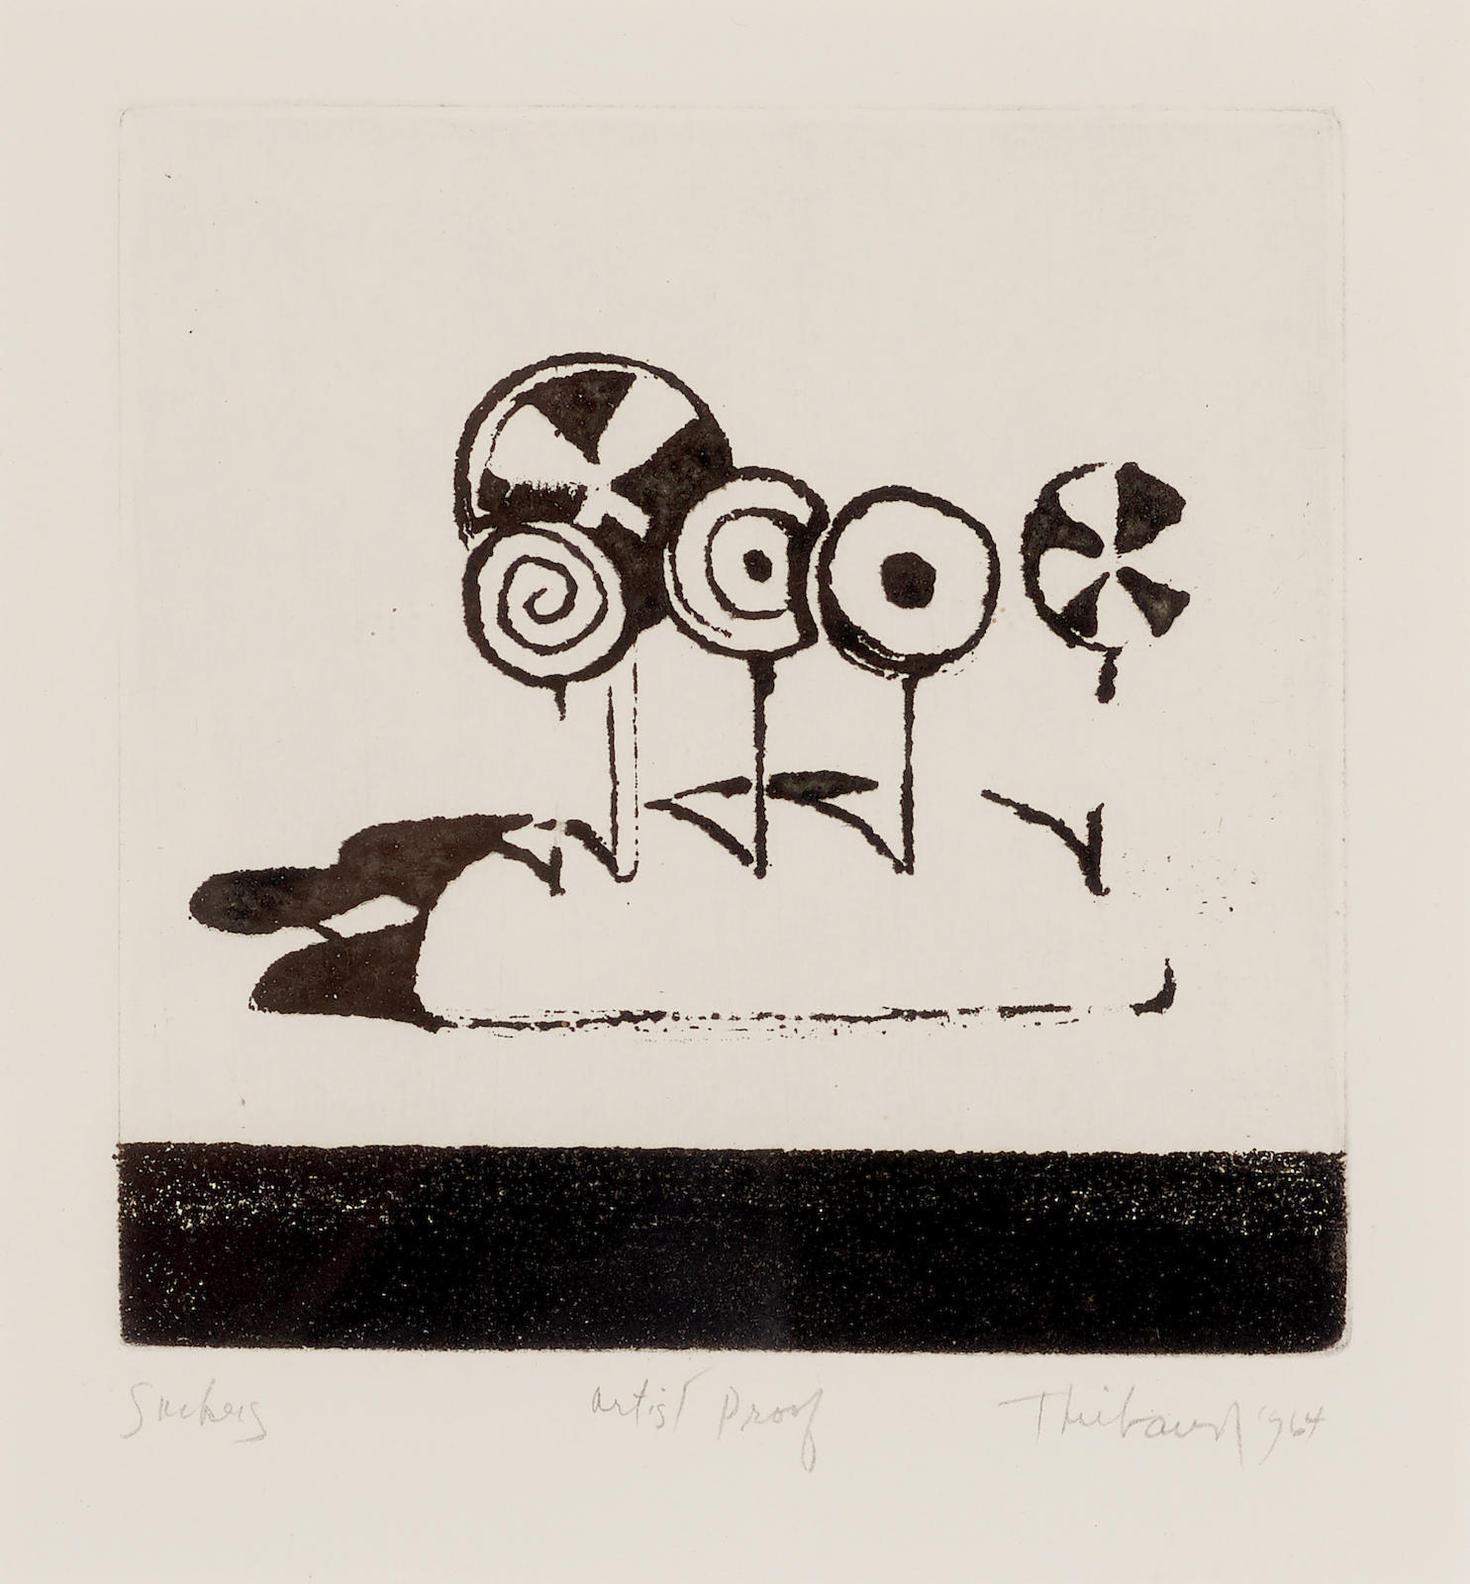 Wayne Thiebaud-Suckers, From Delights-1964